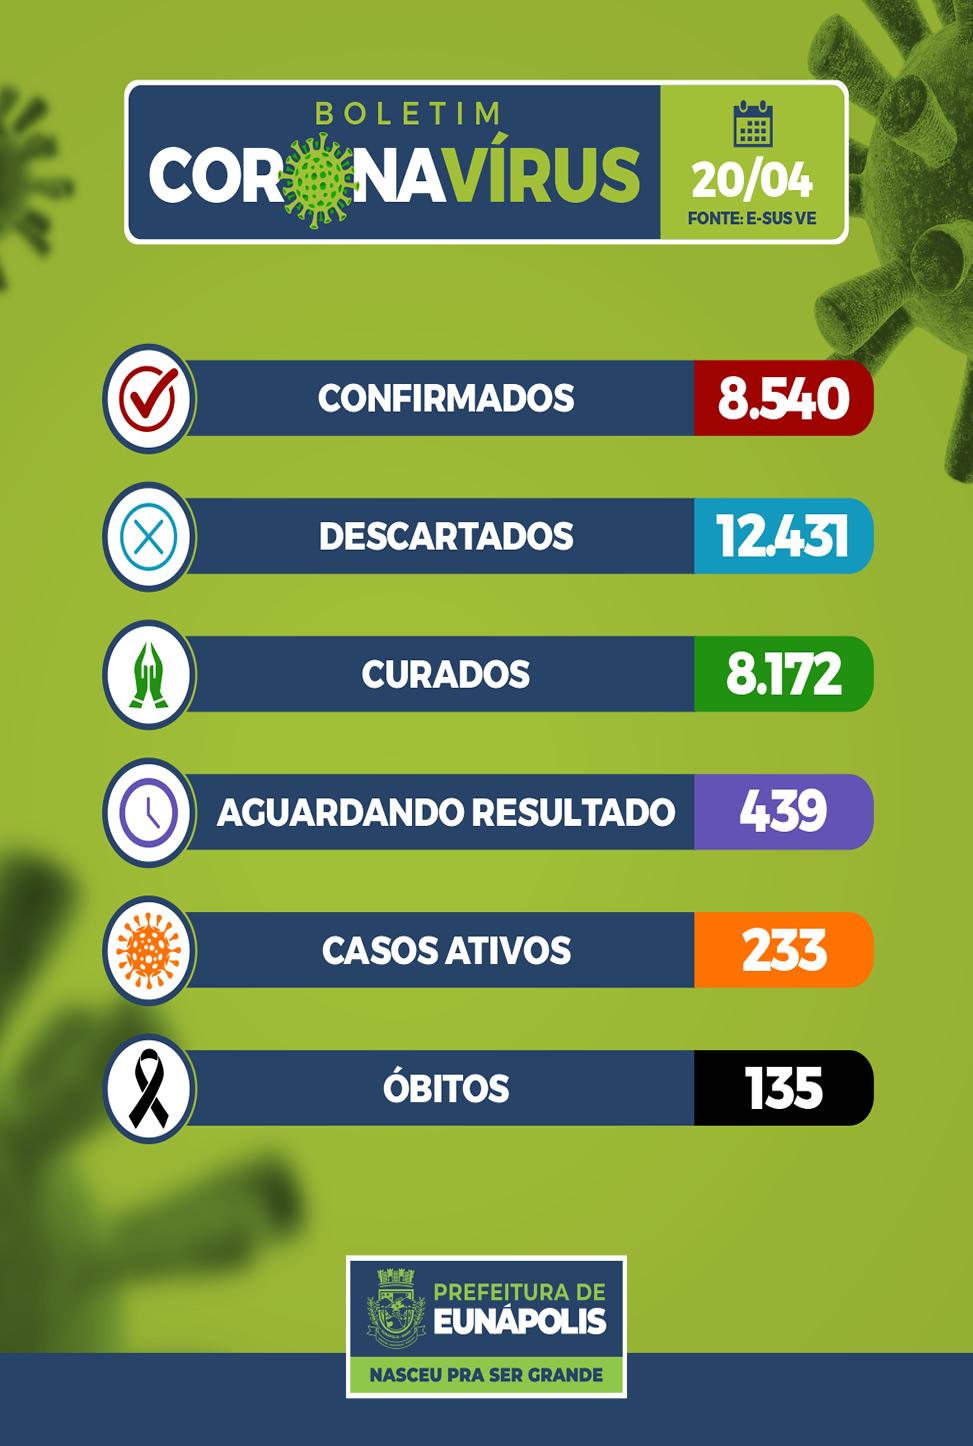 Boletim Epidemiológico Coronavírus do Município de Eunápolis para a data de hoje, 20/04/2021 18